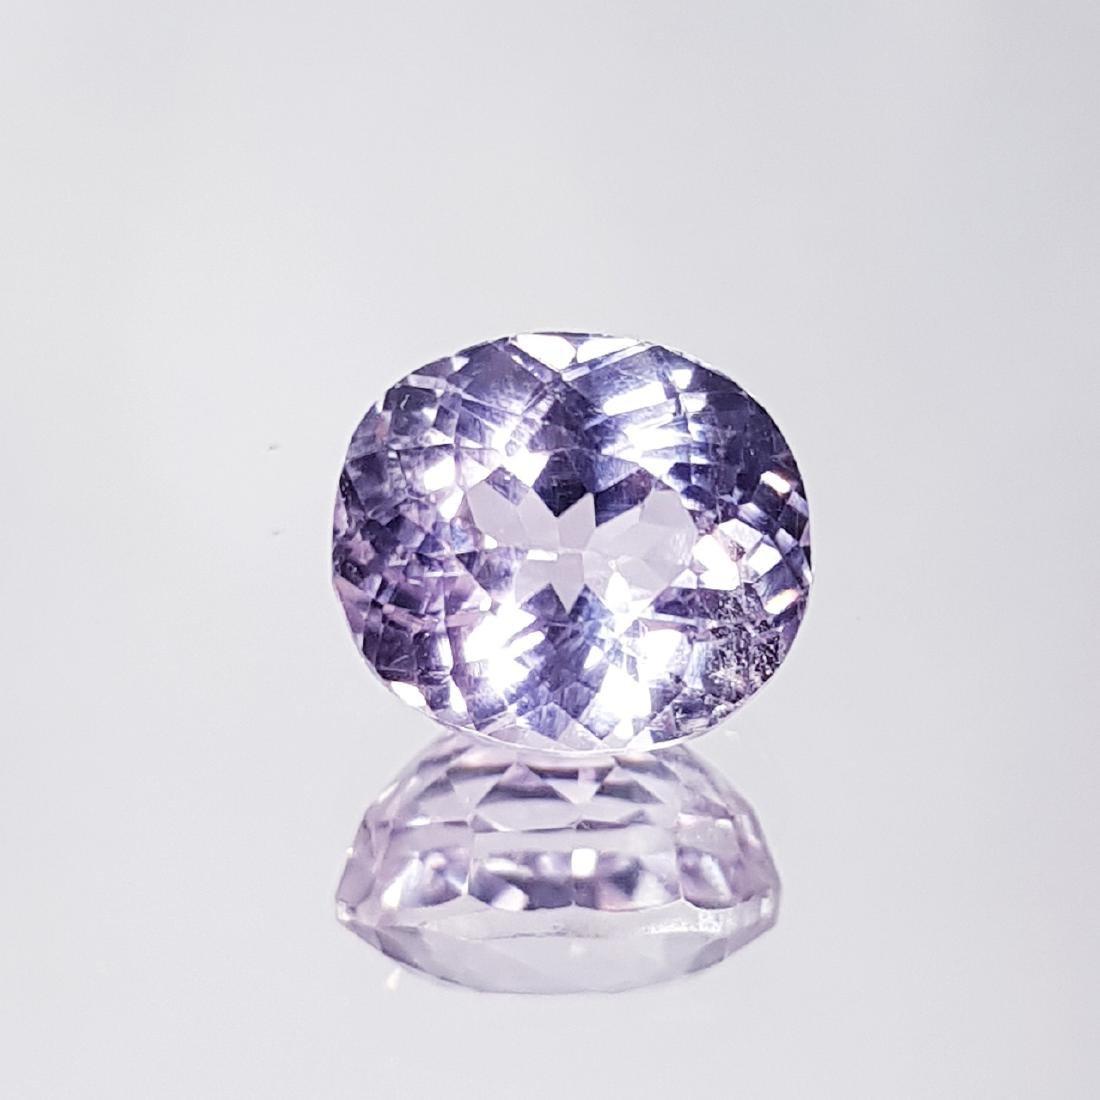 Natural Pink Kunzite - 4.18 ct - 4